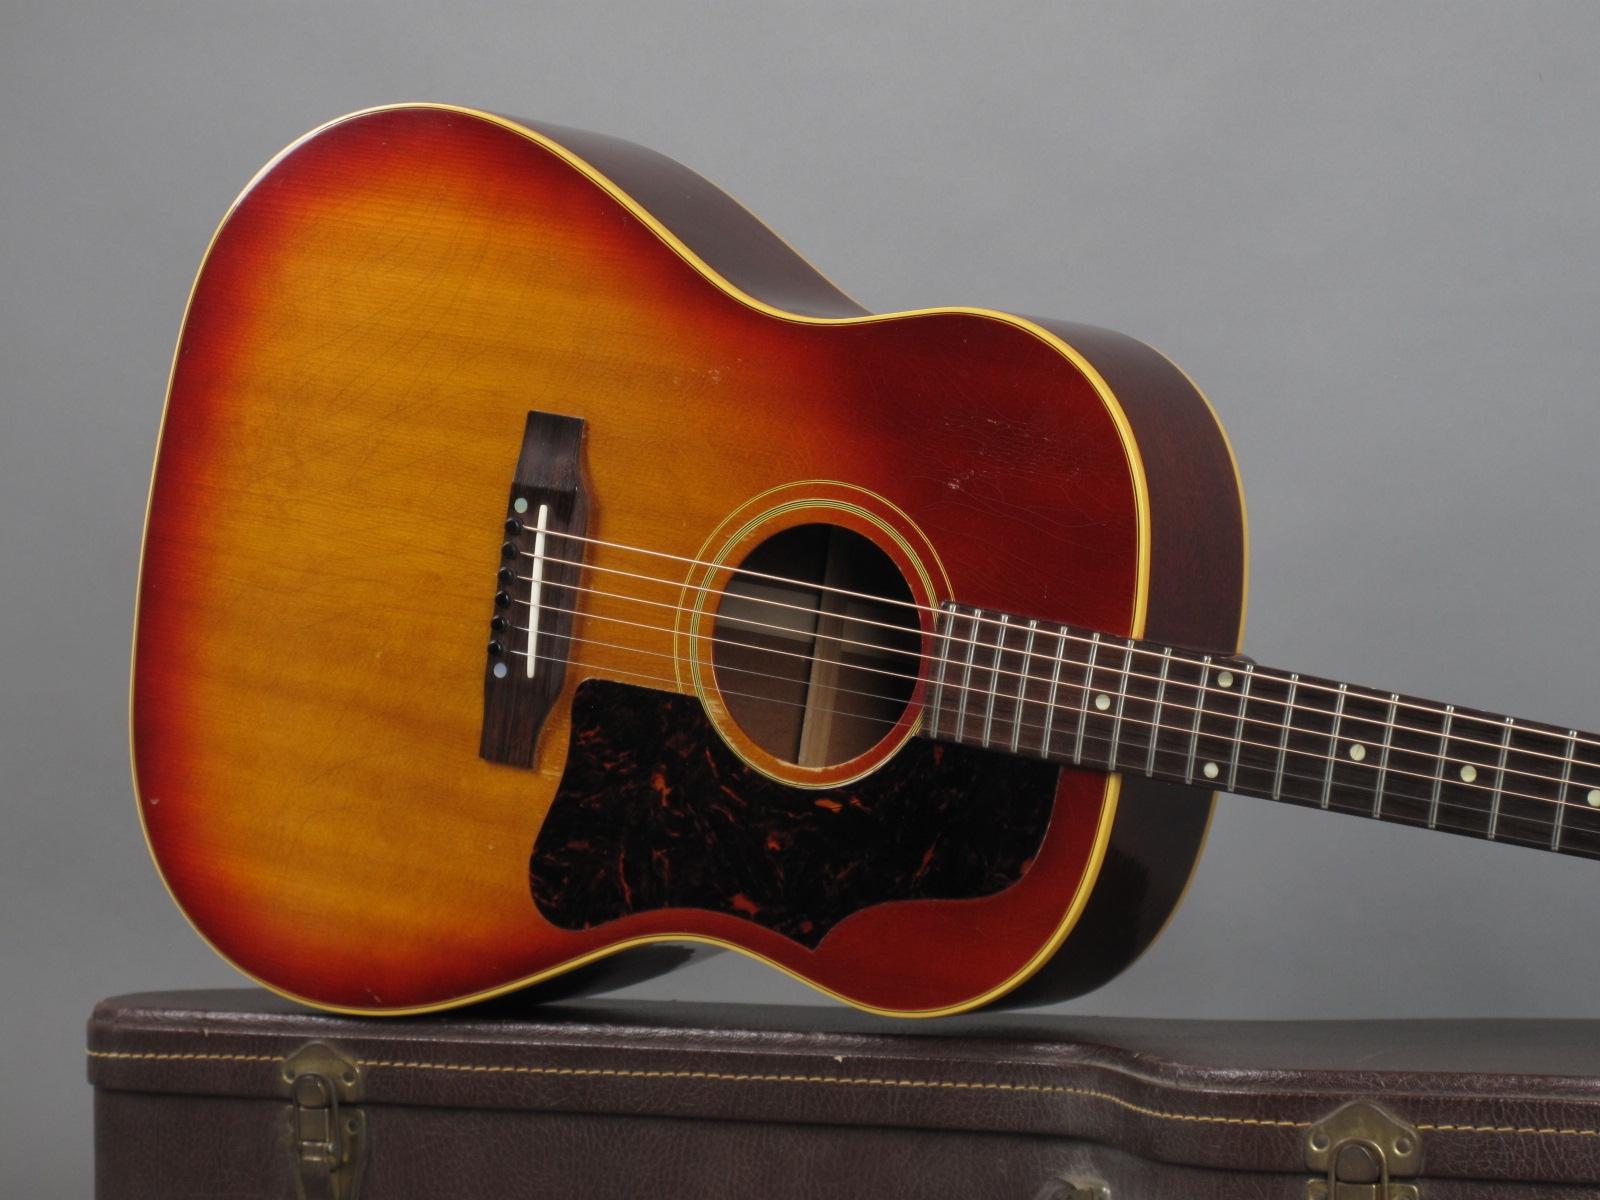 https://guitarpoint.de/app/uploads/products/1963-gibson-j-45-sunburst/1963-Gibson-J-45-Cherry-Sunburst-120522-19.jpg